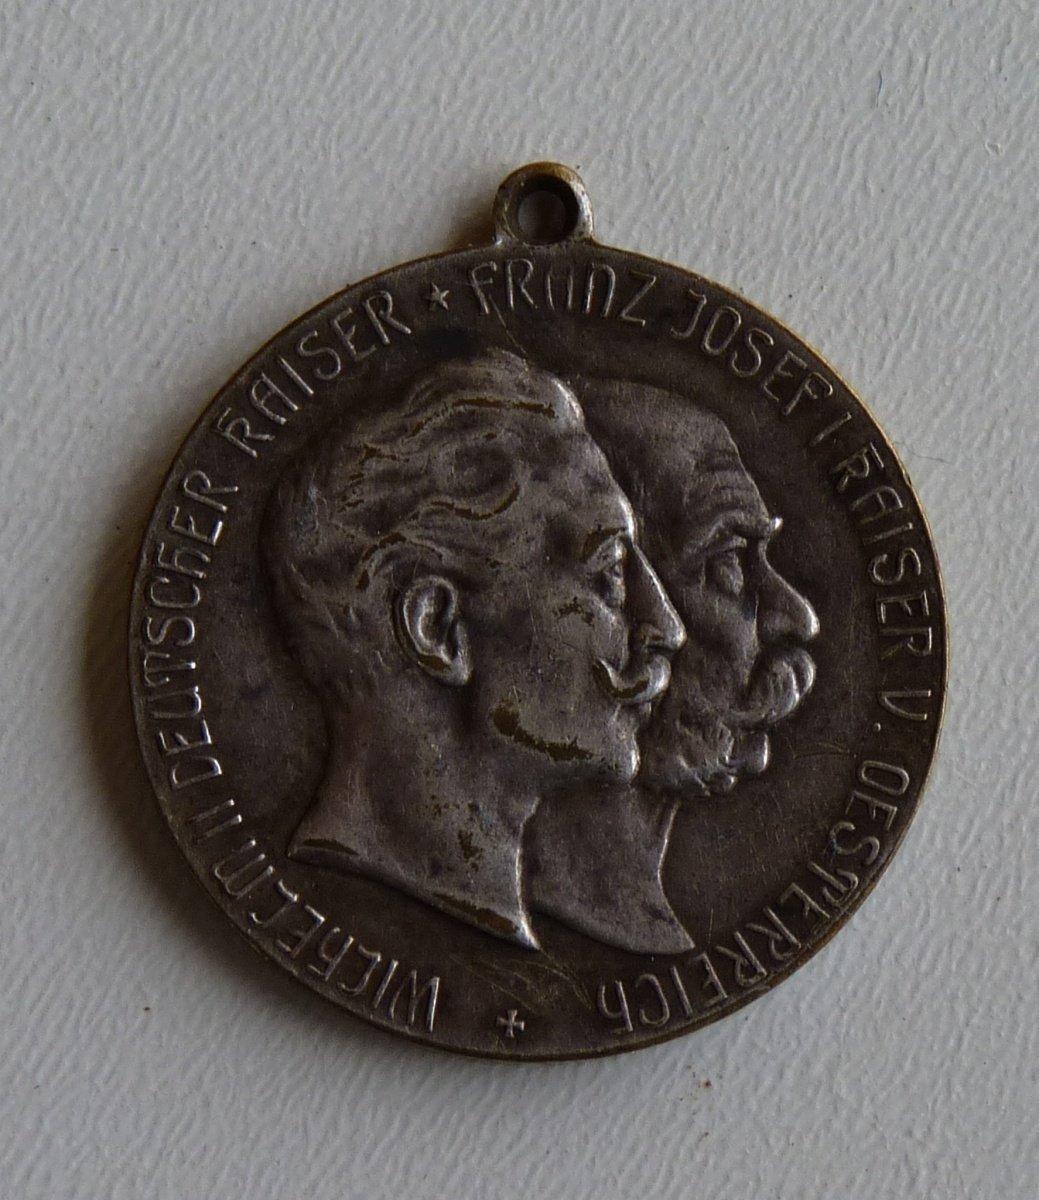 Medaile německého císaře Wilhelma